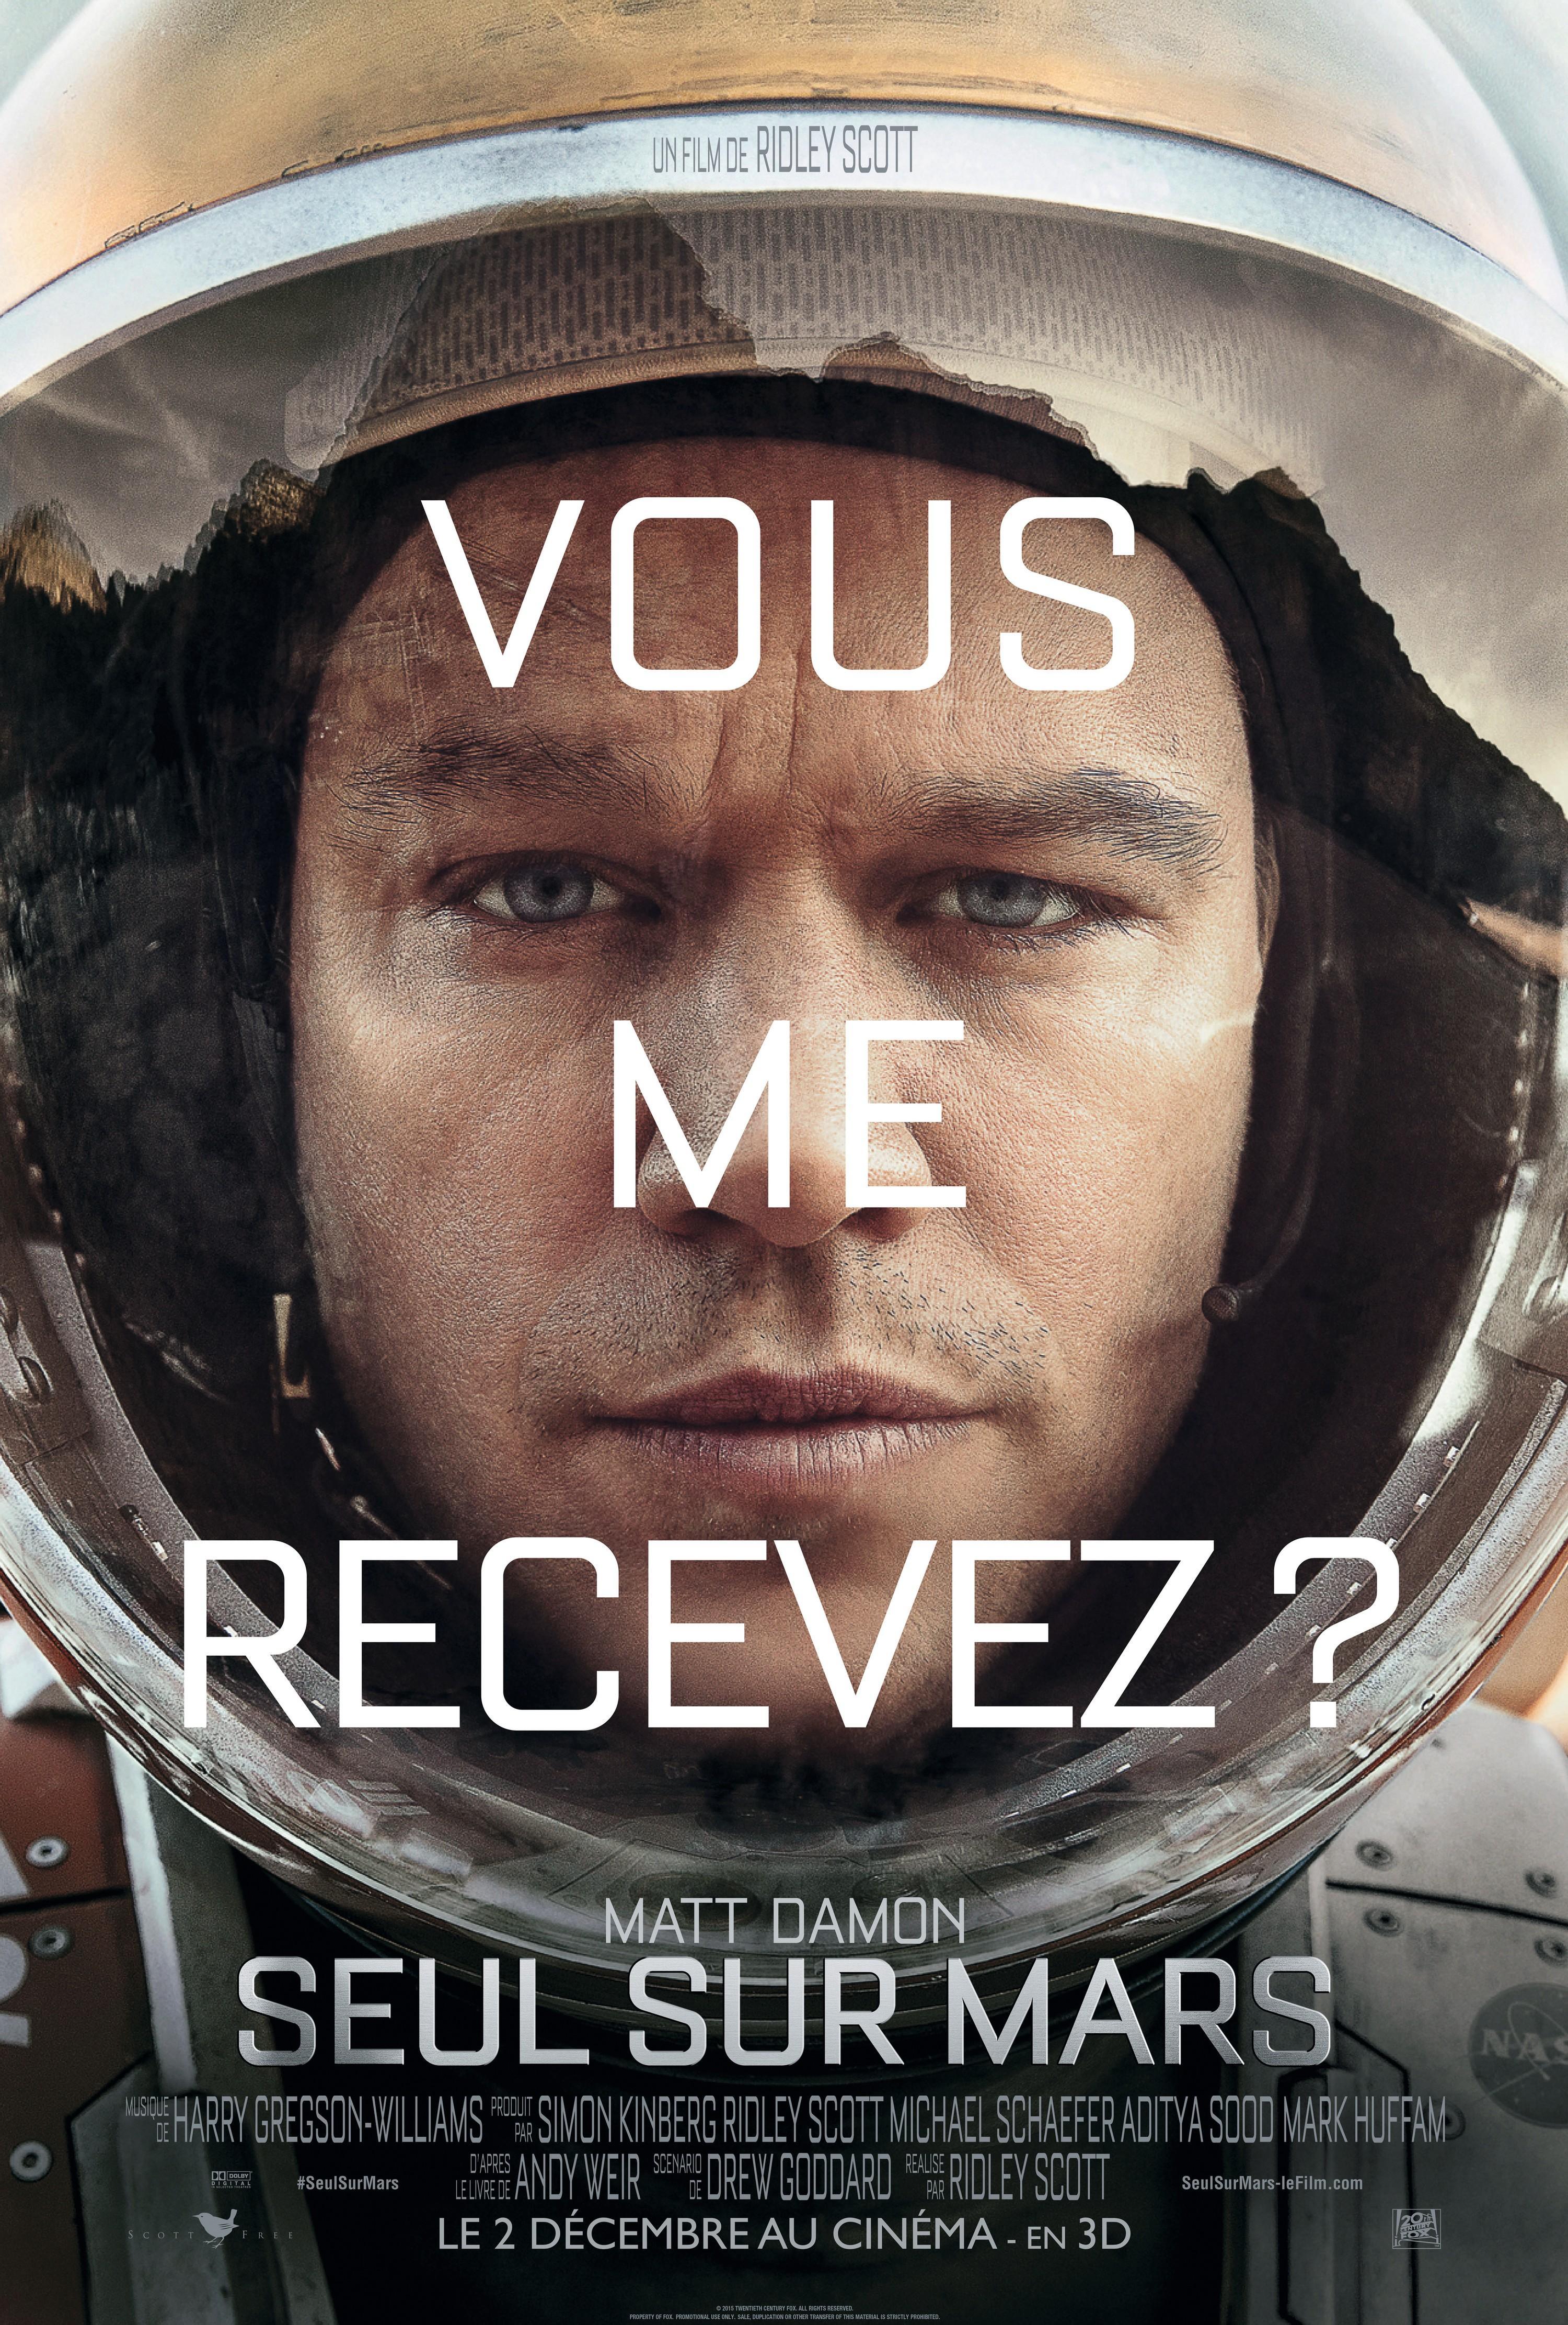 Seul sur Mars de Ridley Scott (2015)